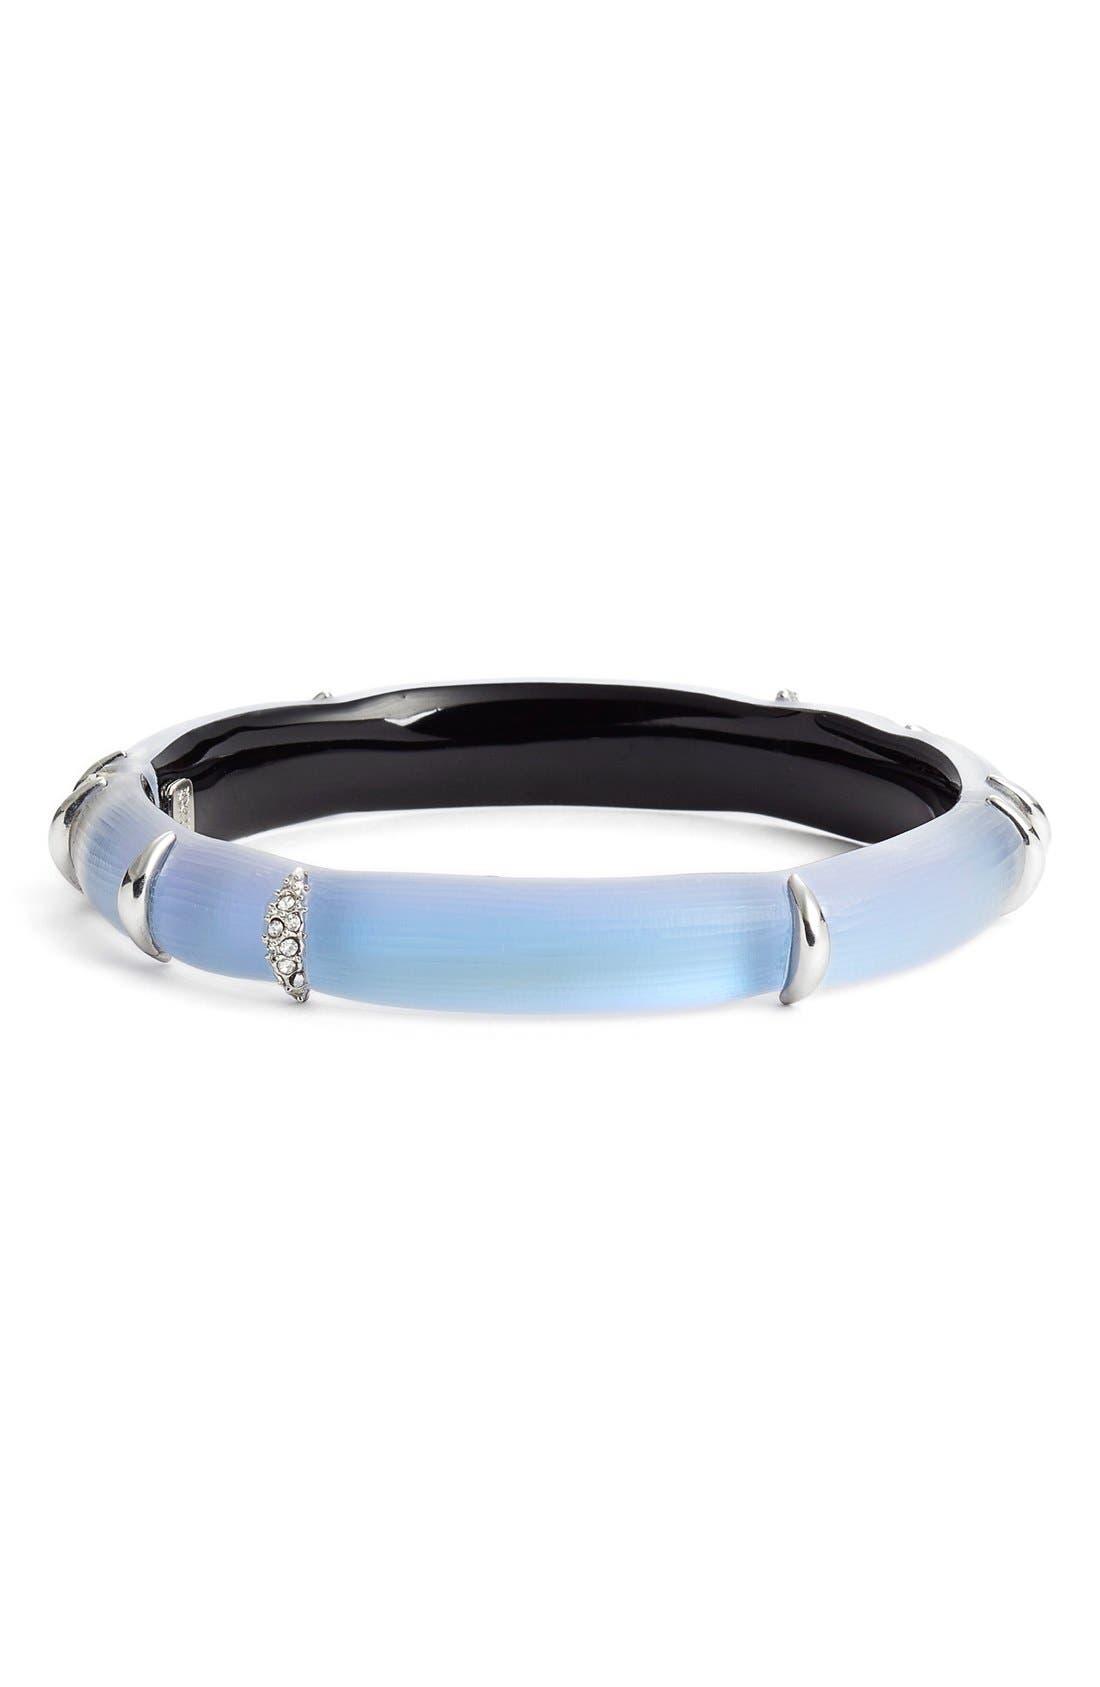 Main Image - Alexis Bittar'Lucite® - Liquid Stripe' Bangle Bracelet